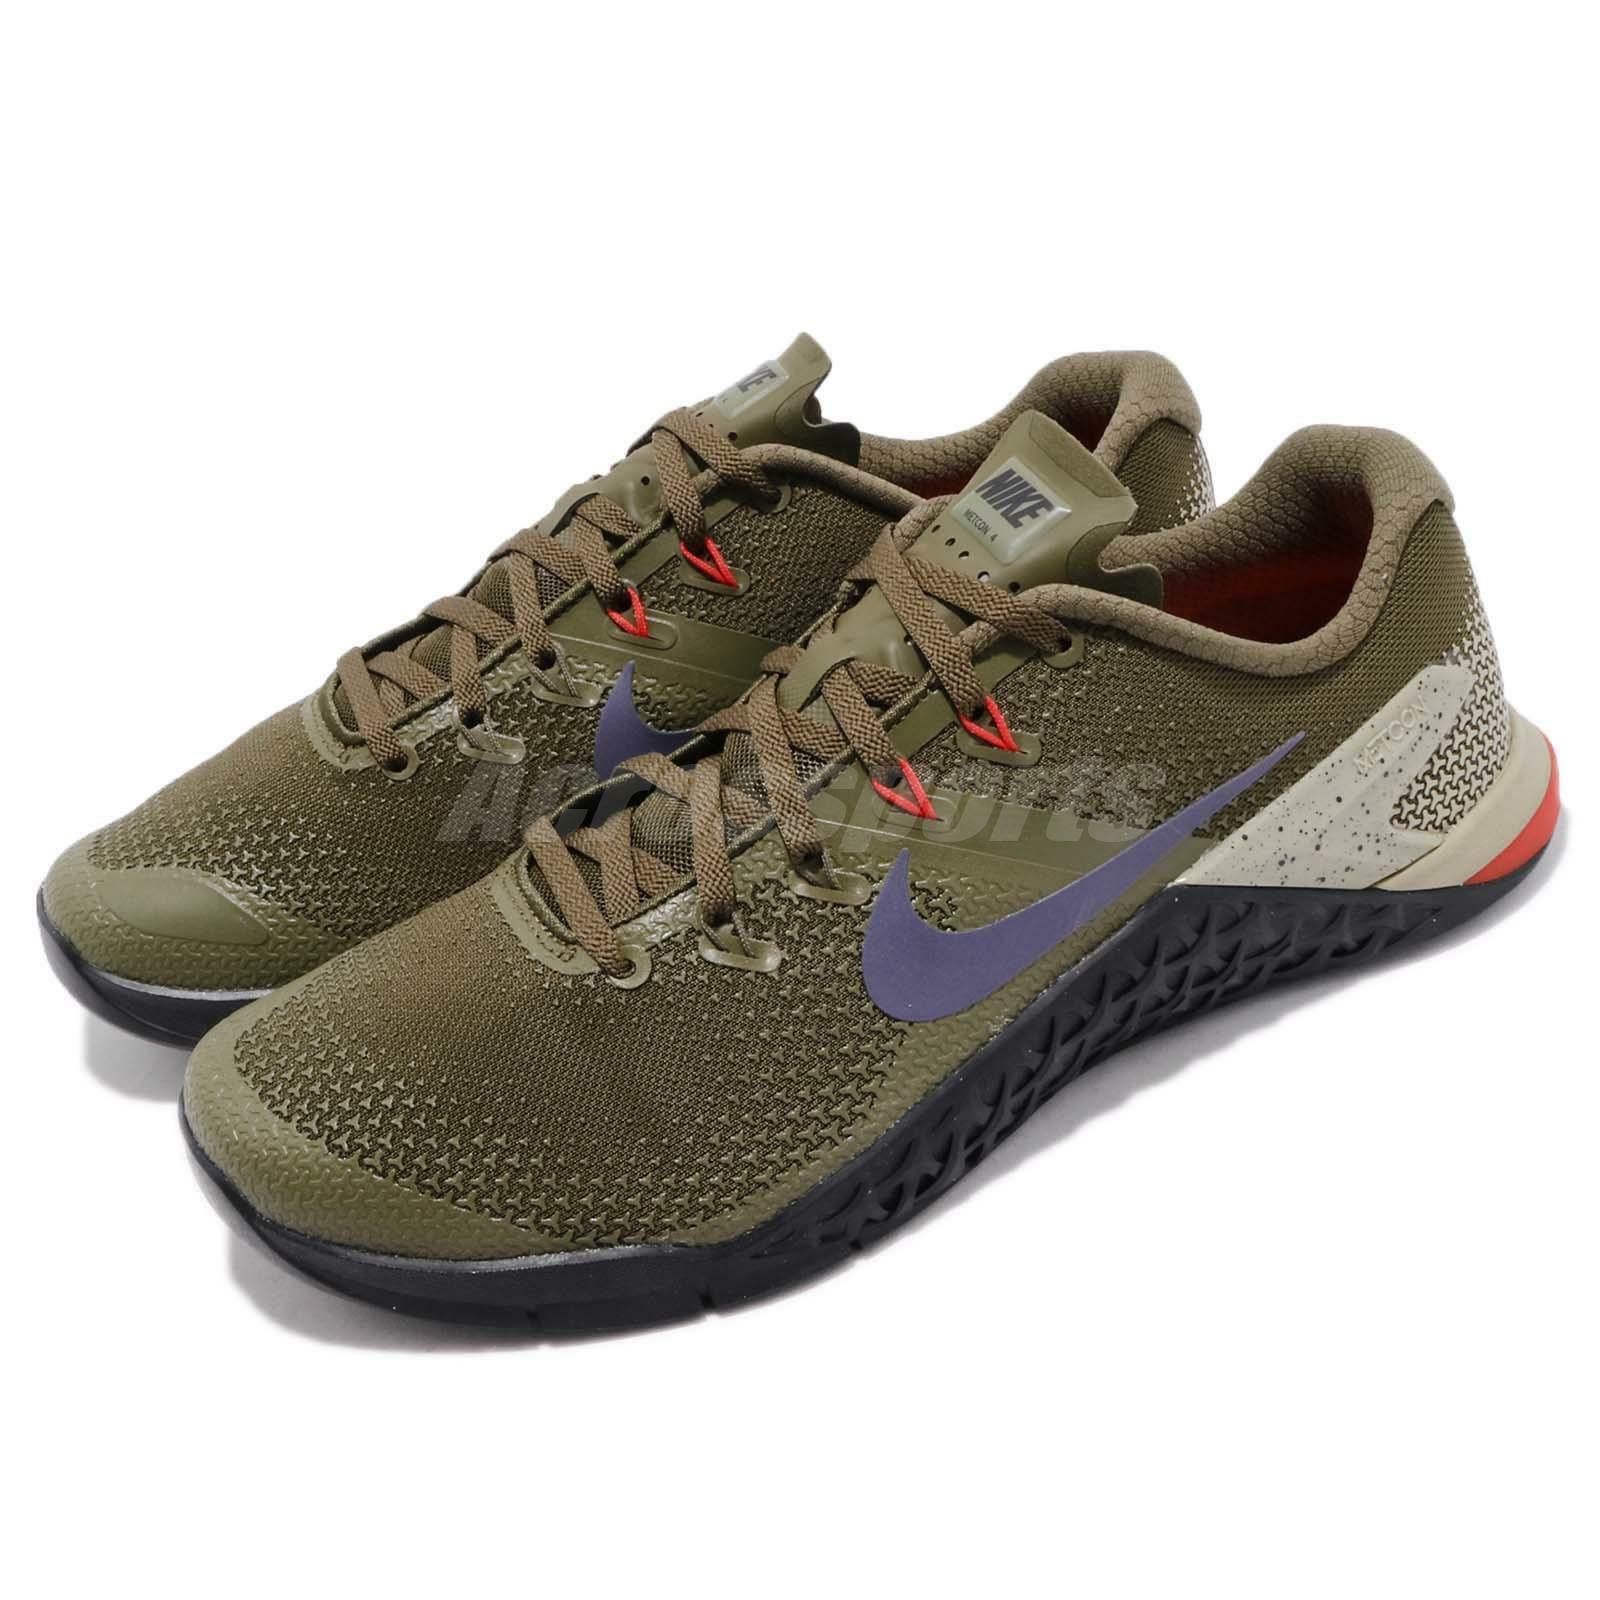 Nike Metcon 4 IV Olive Canvas Indigo Burst homme Cross Training chaussures AH7453-342